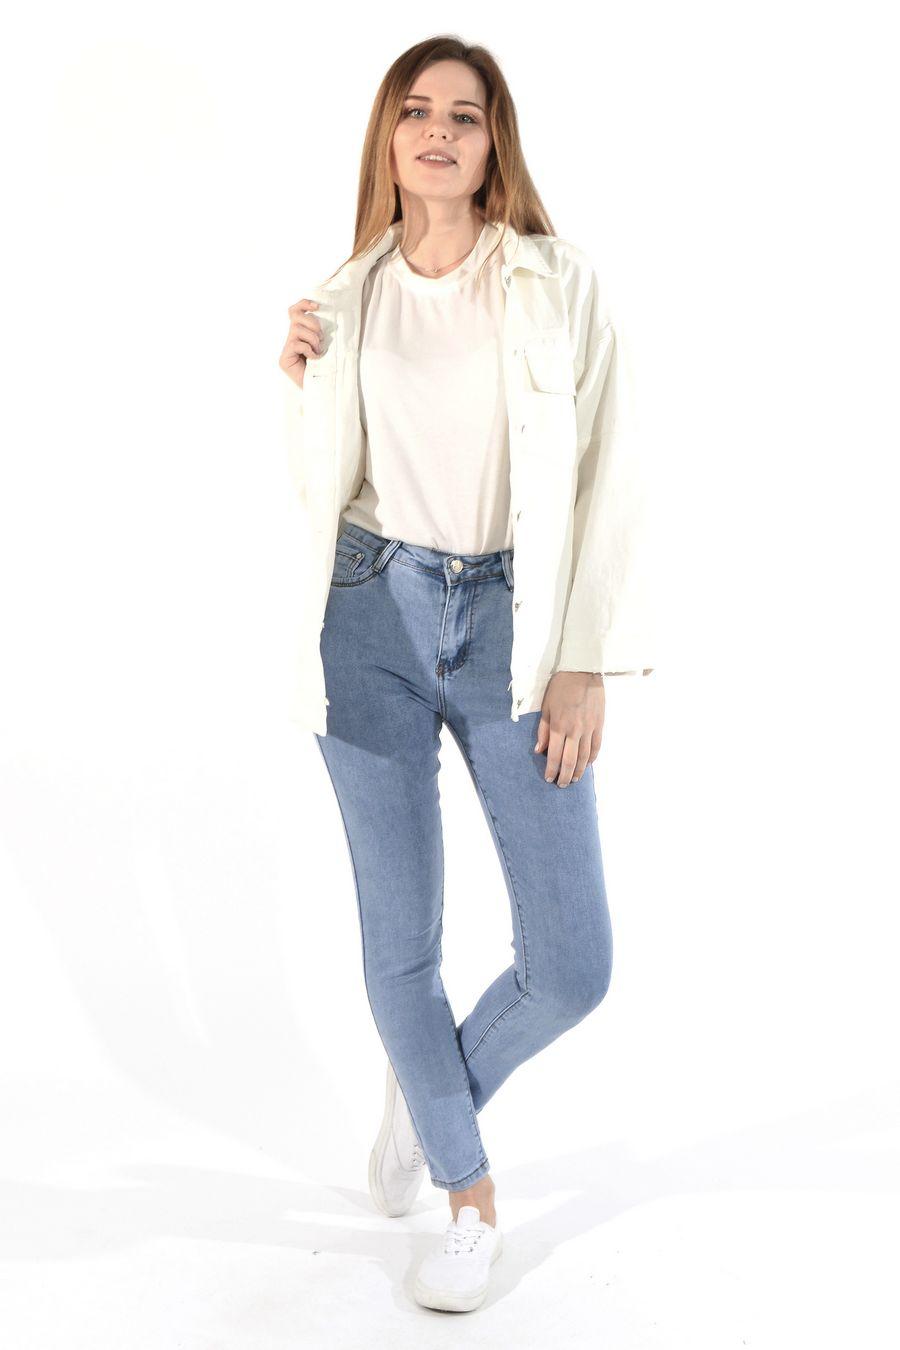 Жакет женский (джинсовка) LRZBS 955 - фото 3